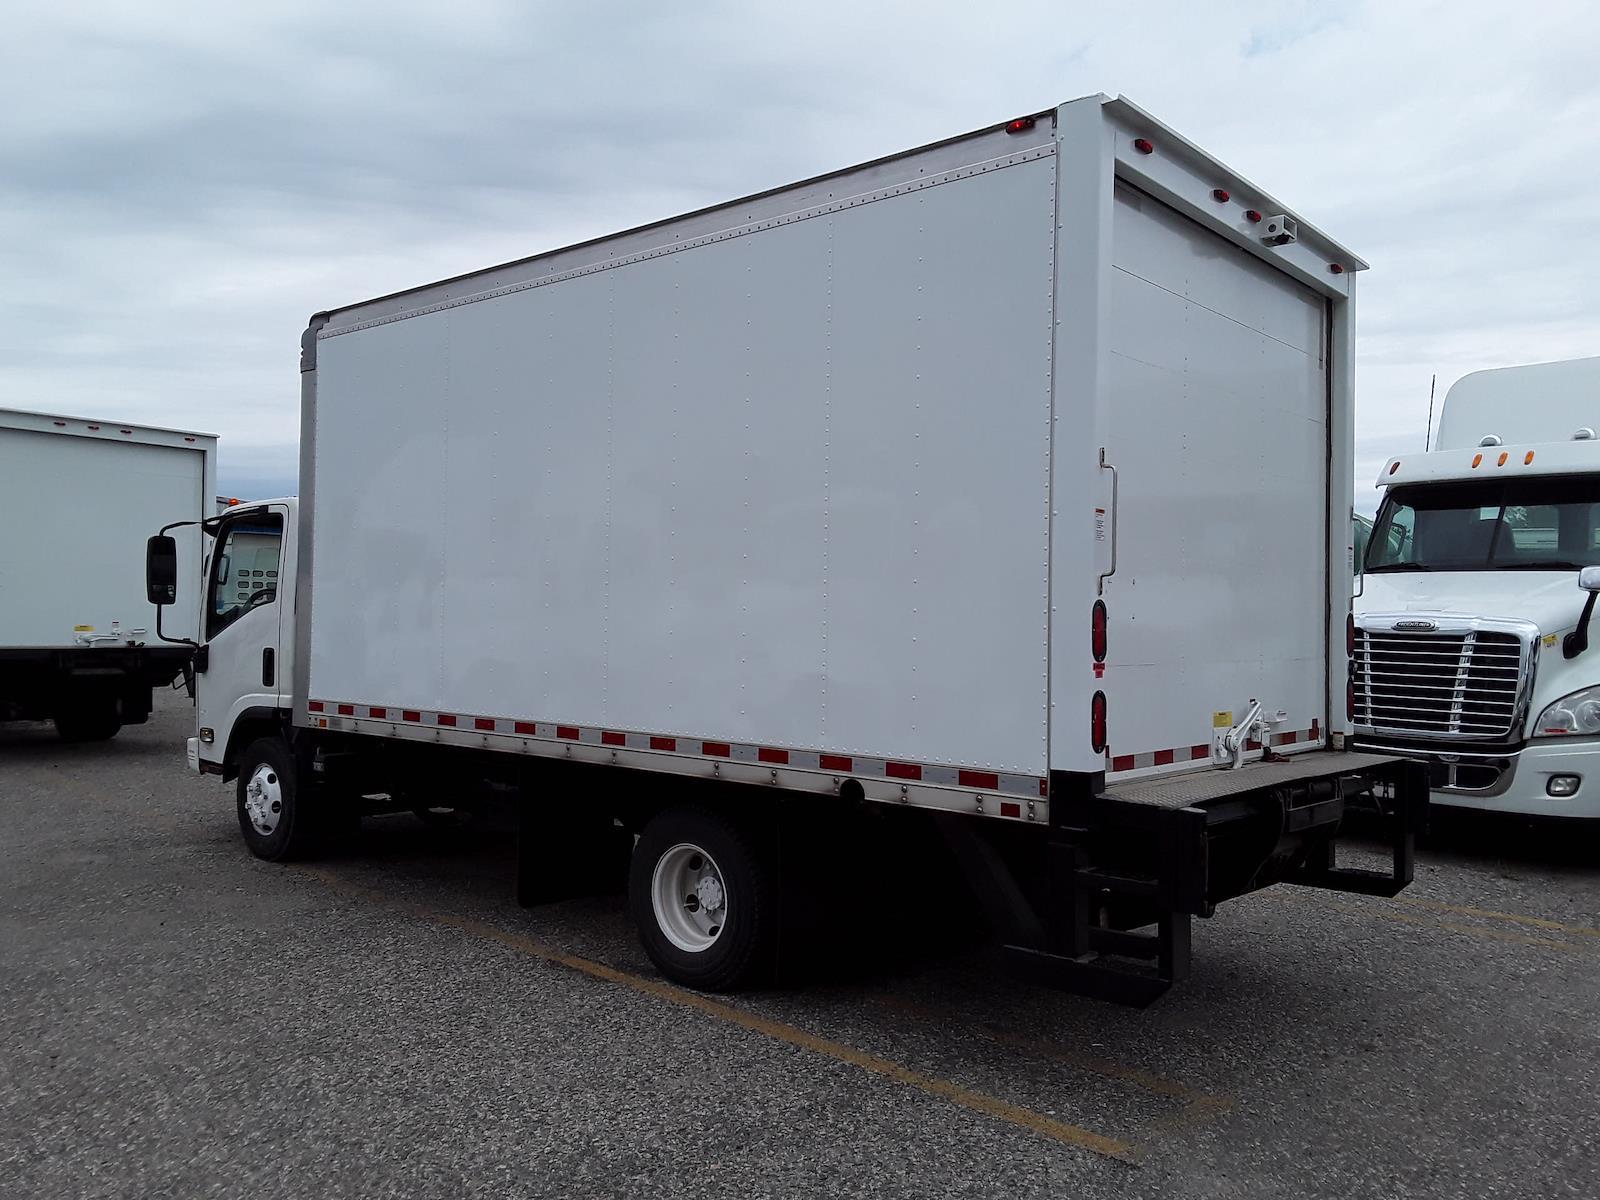 2015 Isuzu NPR Regular Cab 4x2, Dry Freight #649663 - photo 1